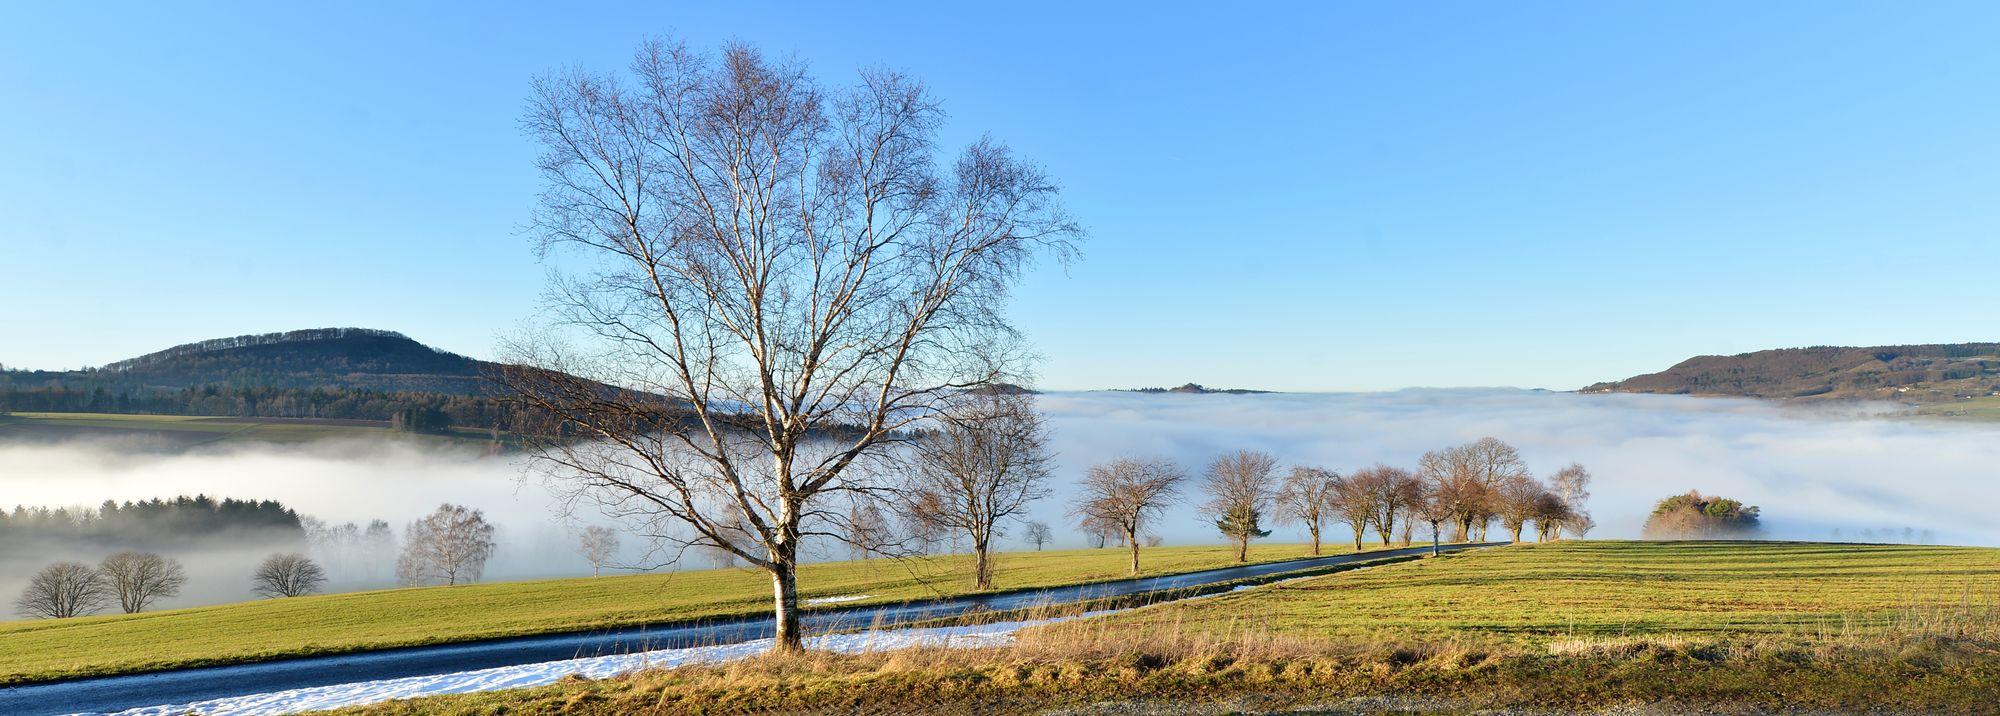 Gersfelder Kessel im Nebel